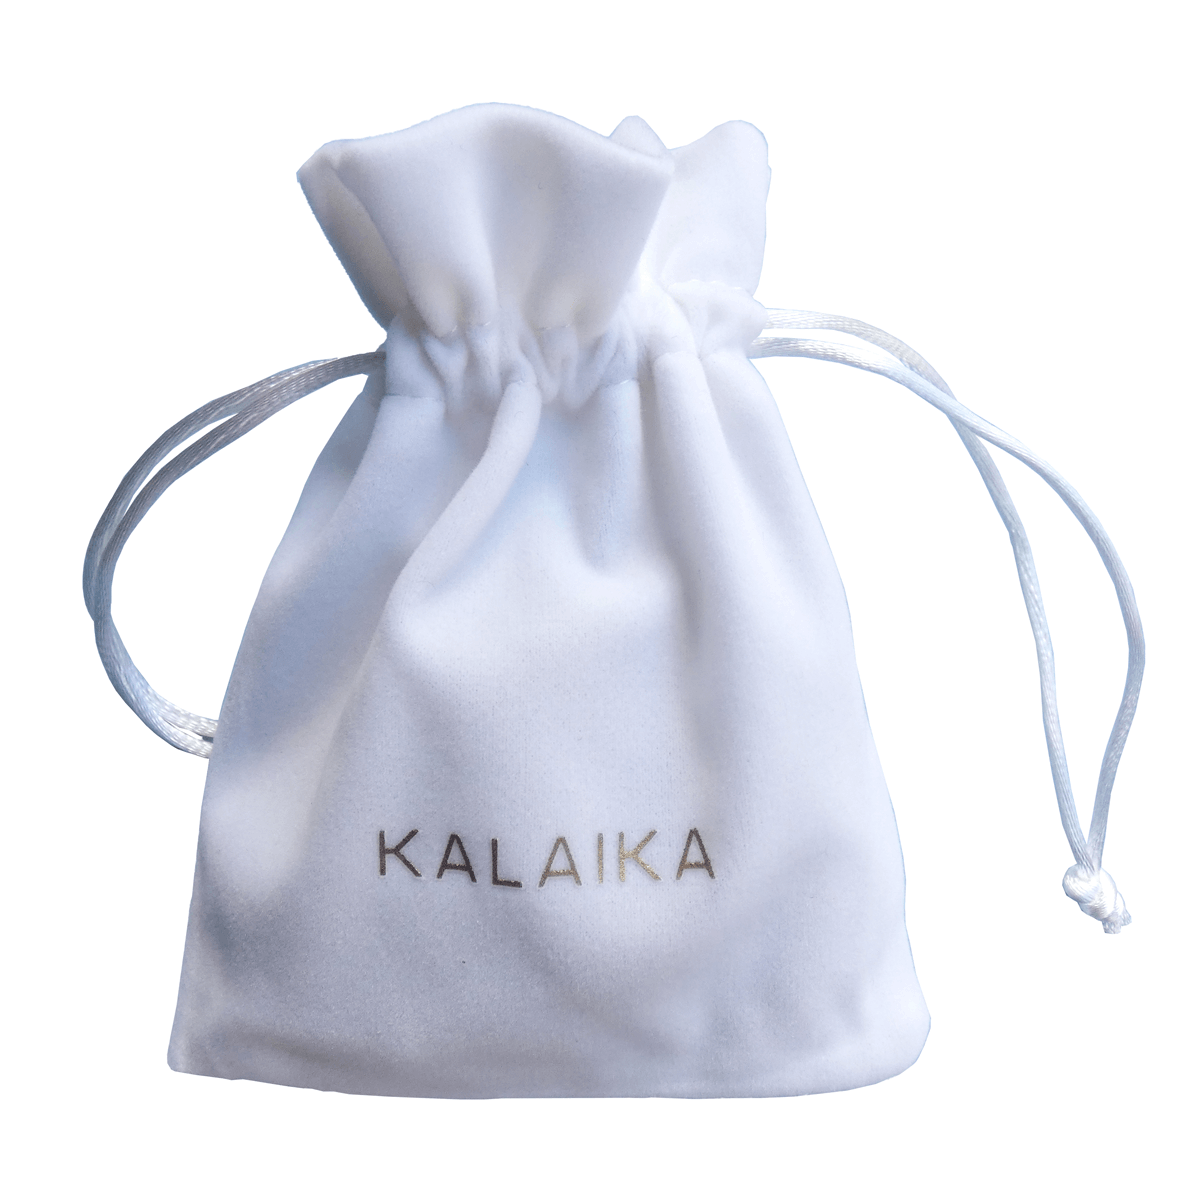 kalaika chunky chaîne bracelet maille acrylique - cassisroyal.com